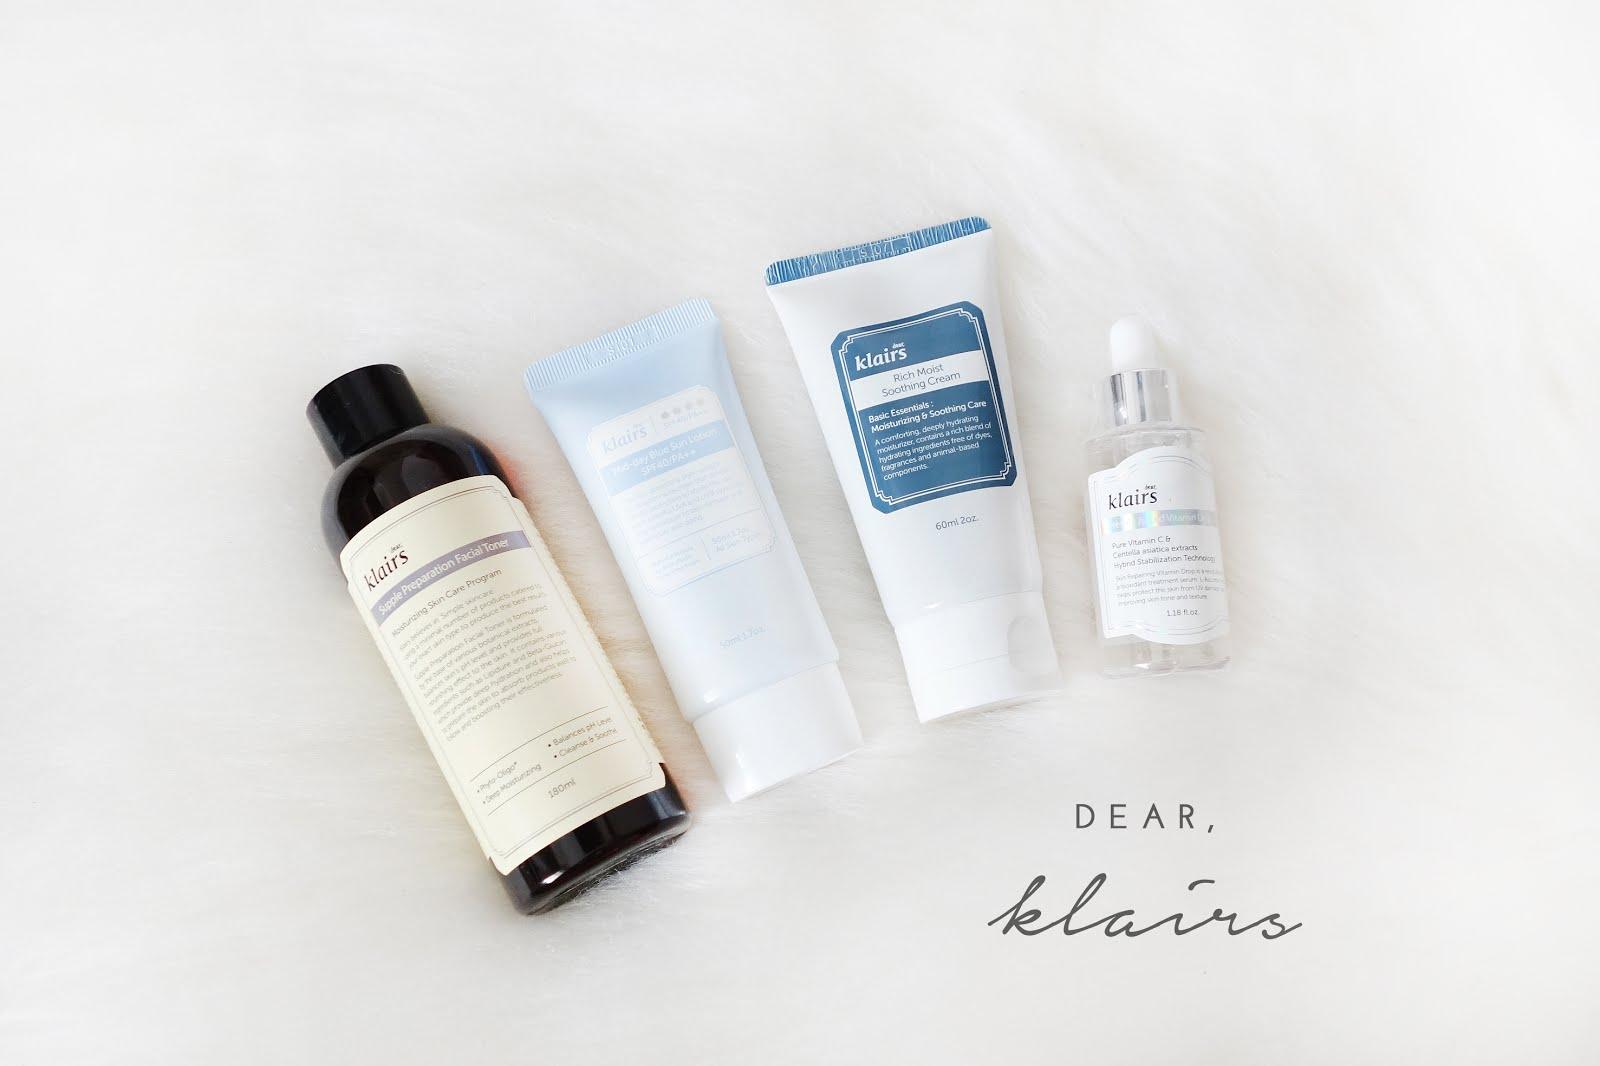 Korean Skincare Haul Mini Reviews Xueqis Beauty Episode Nature Republic Herb Blending Toner Klairs Supple Preparation Facial S28